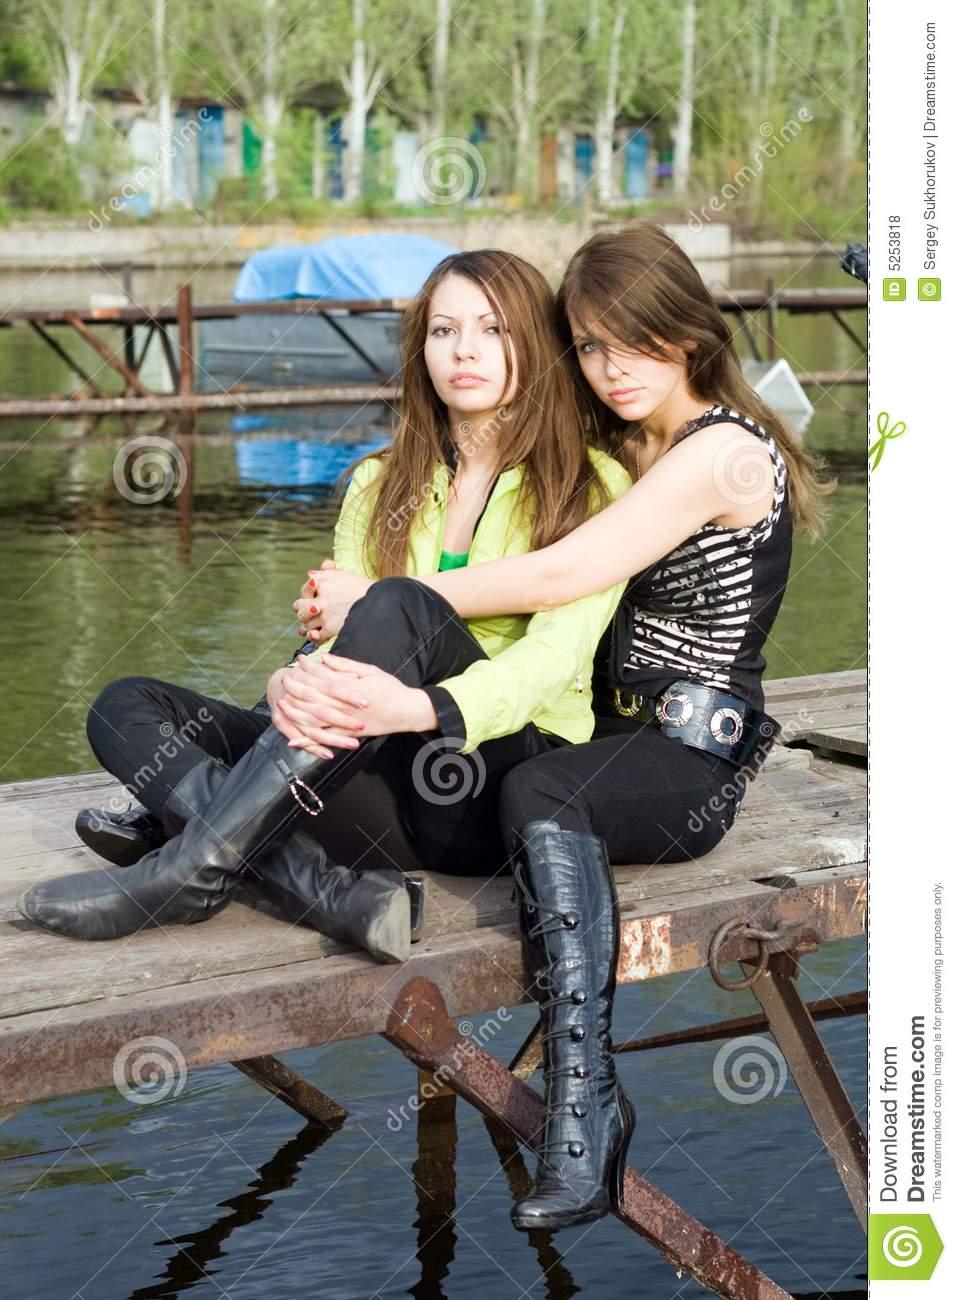 Фото двух девушек вместе 21 фотография